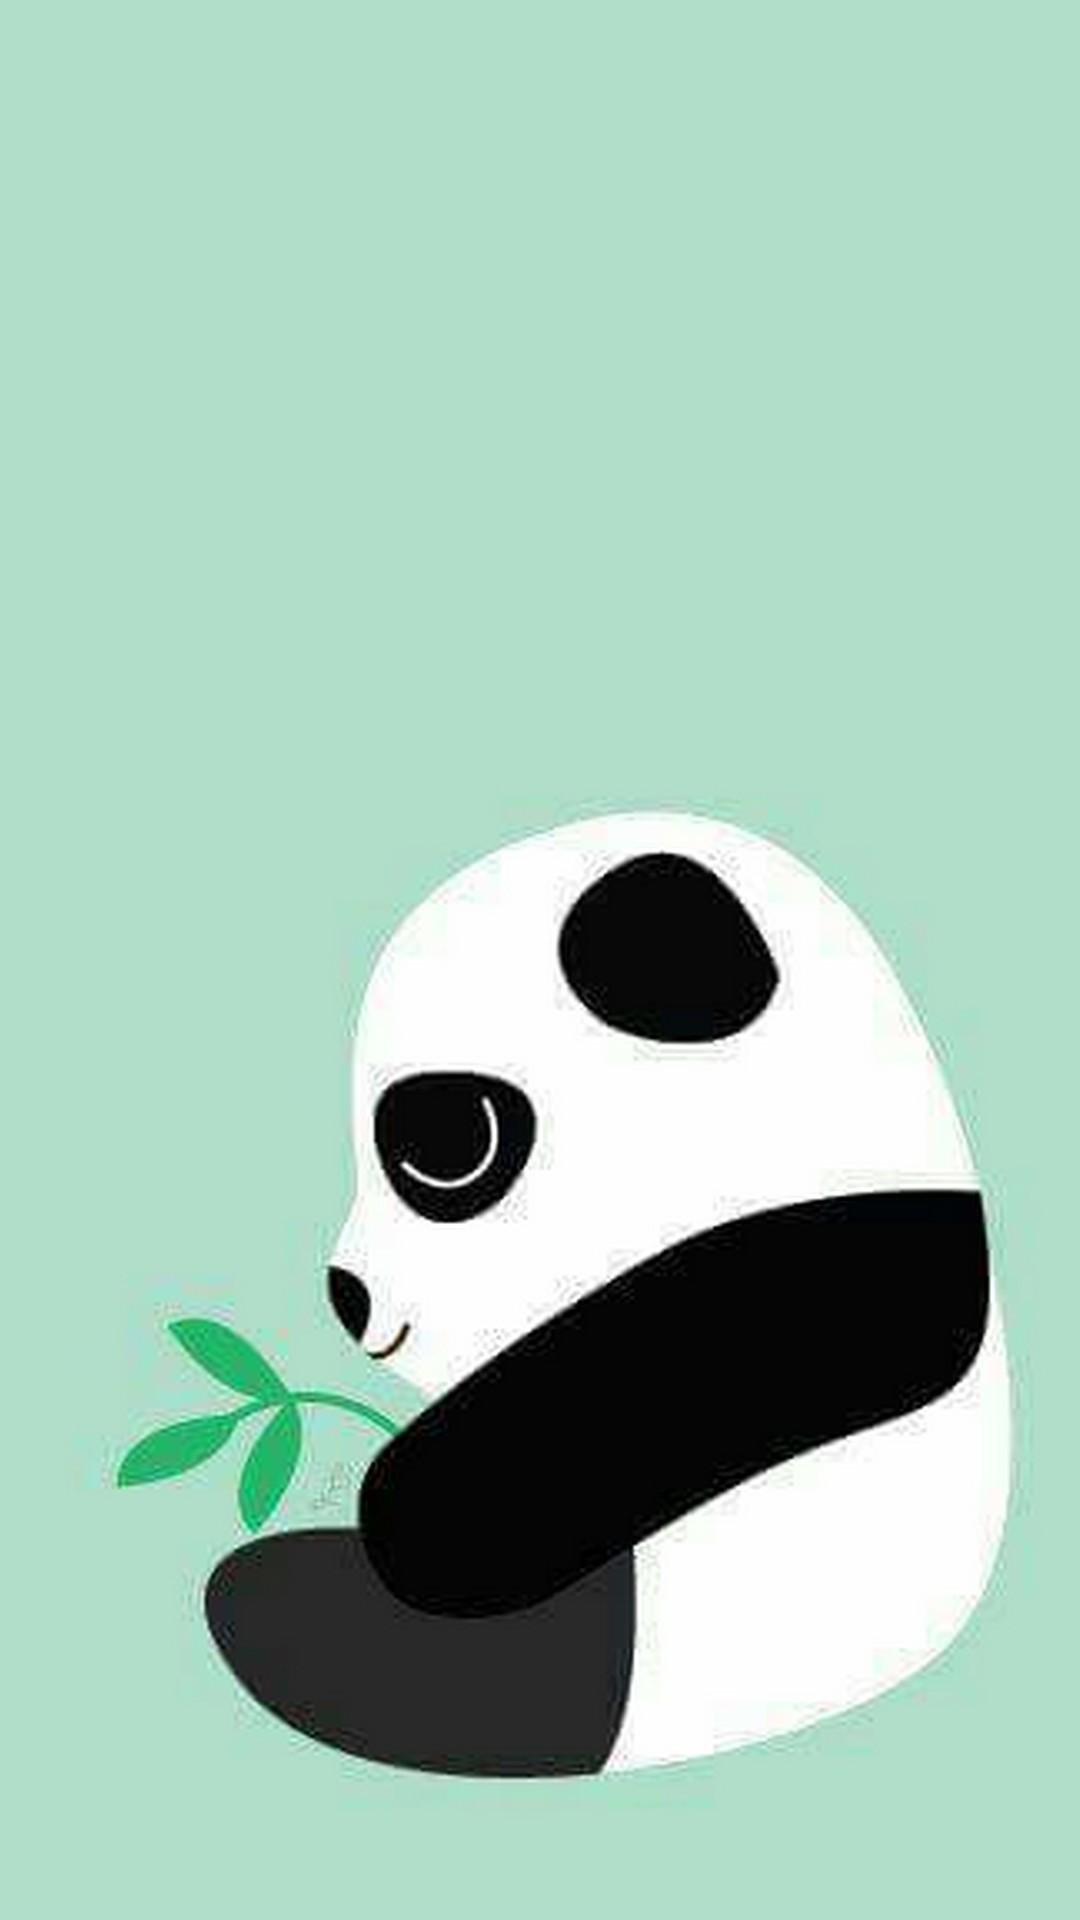 Wallpaper Panda Pictures